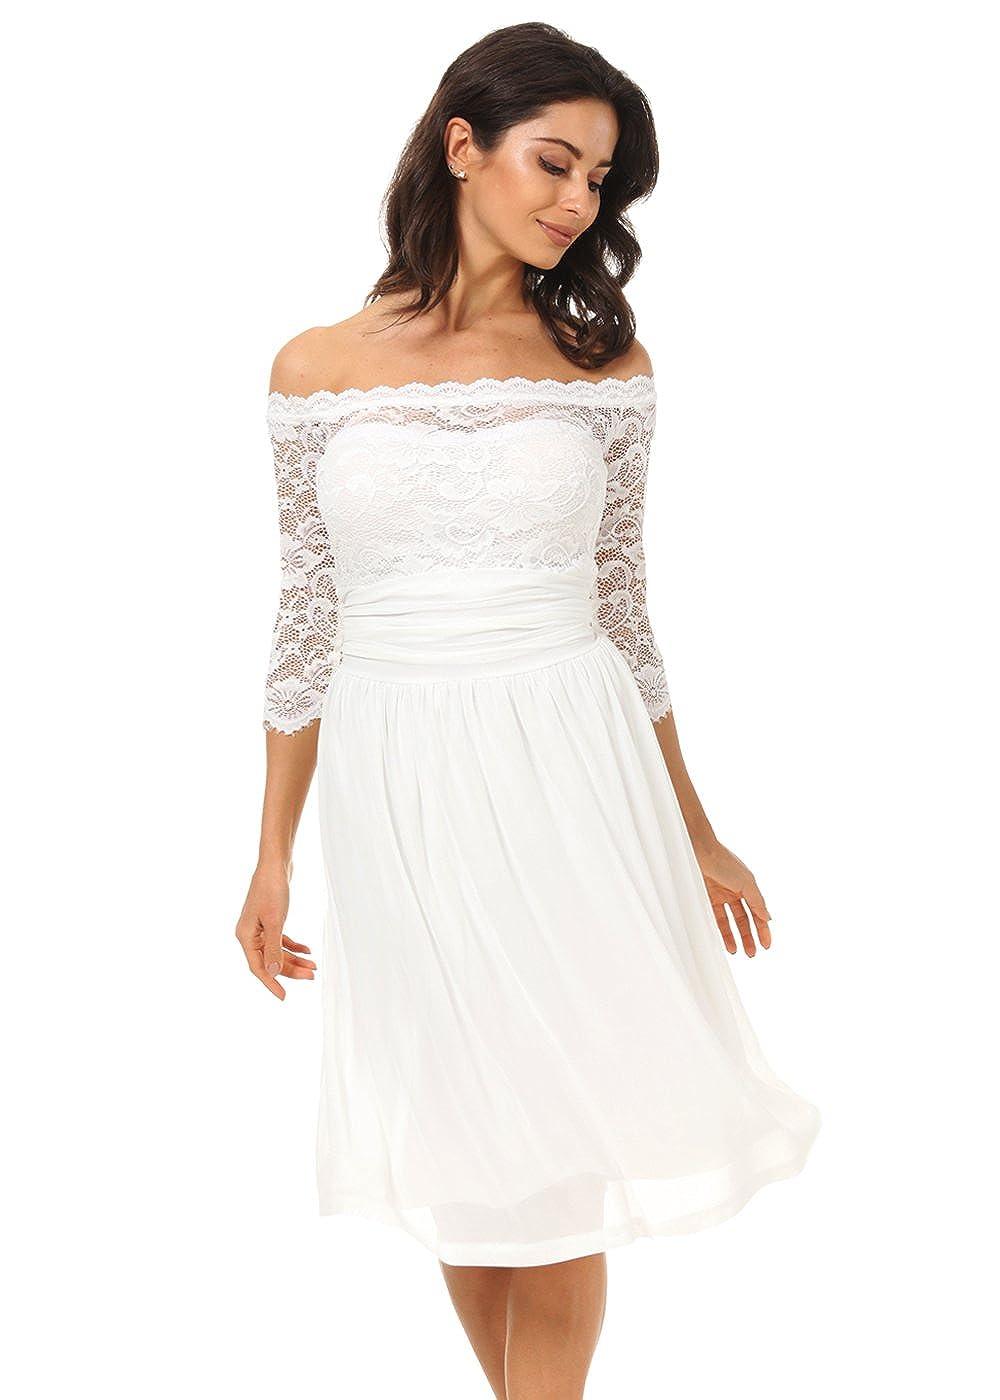 20bcb5c33f992 Hand wash cold? Length:0X-41.0 inches, 1X-41.2 inches, 2X-41.4 inches,  3X-41.7 inches, 4X-42.5 inches, 5X-43.0 inches. Double layer design: Tube  dress ...